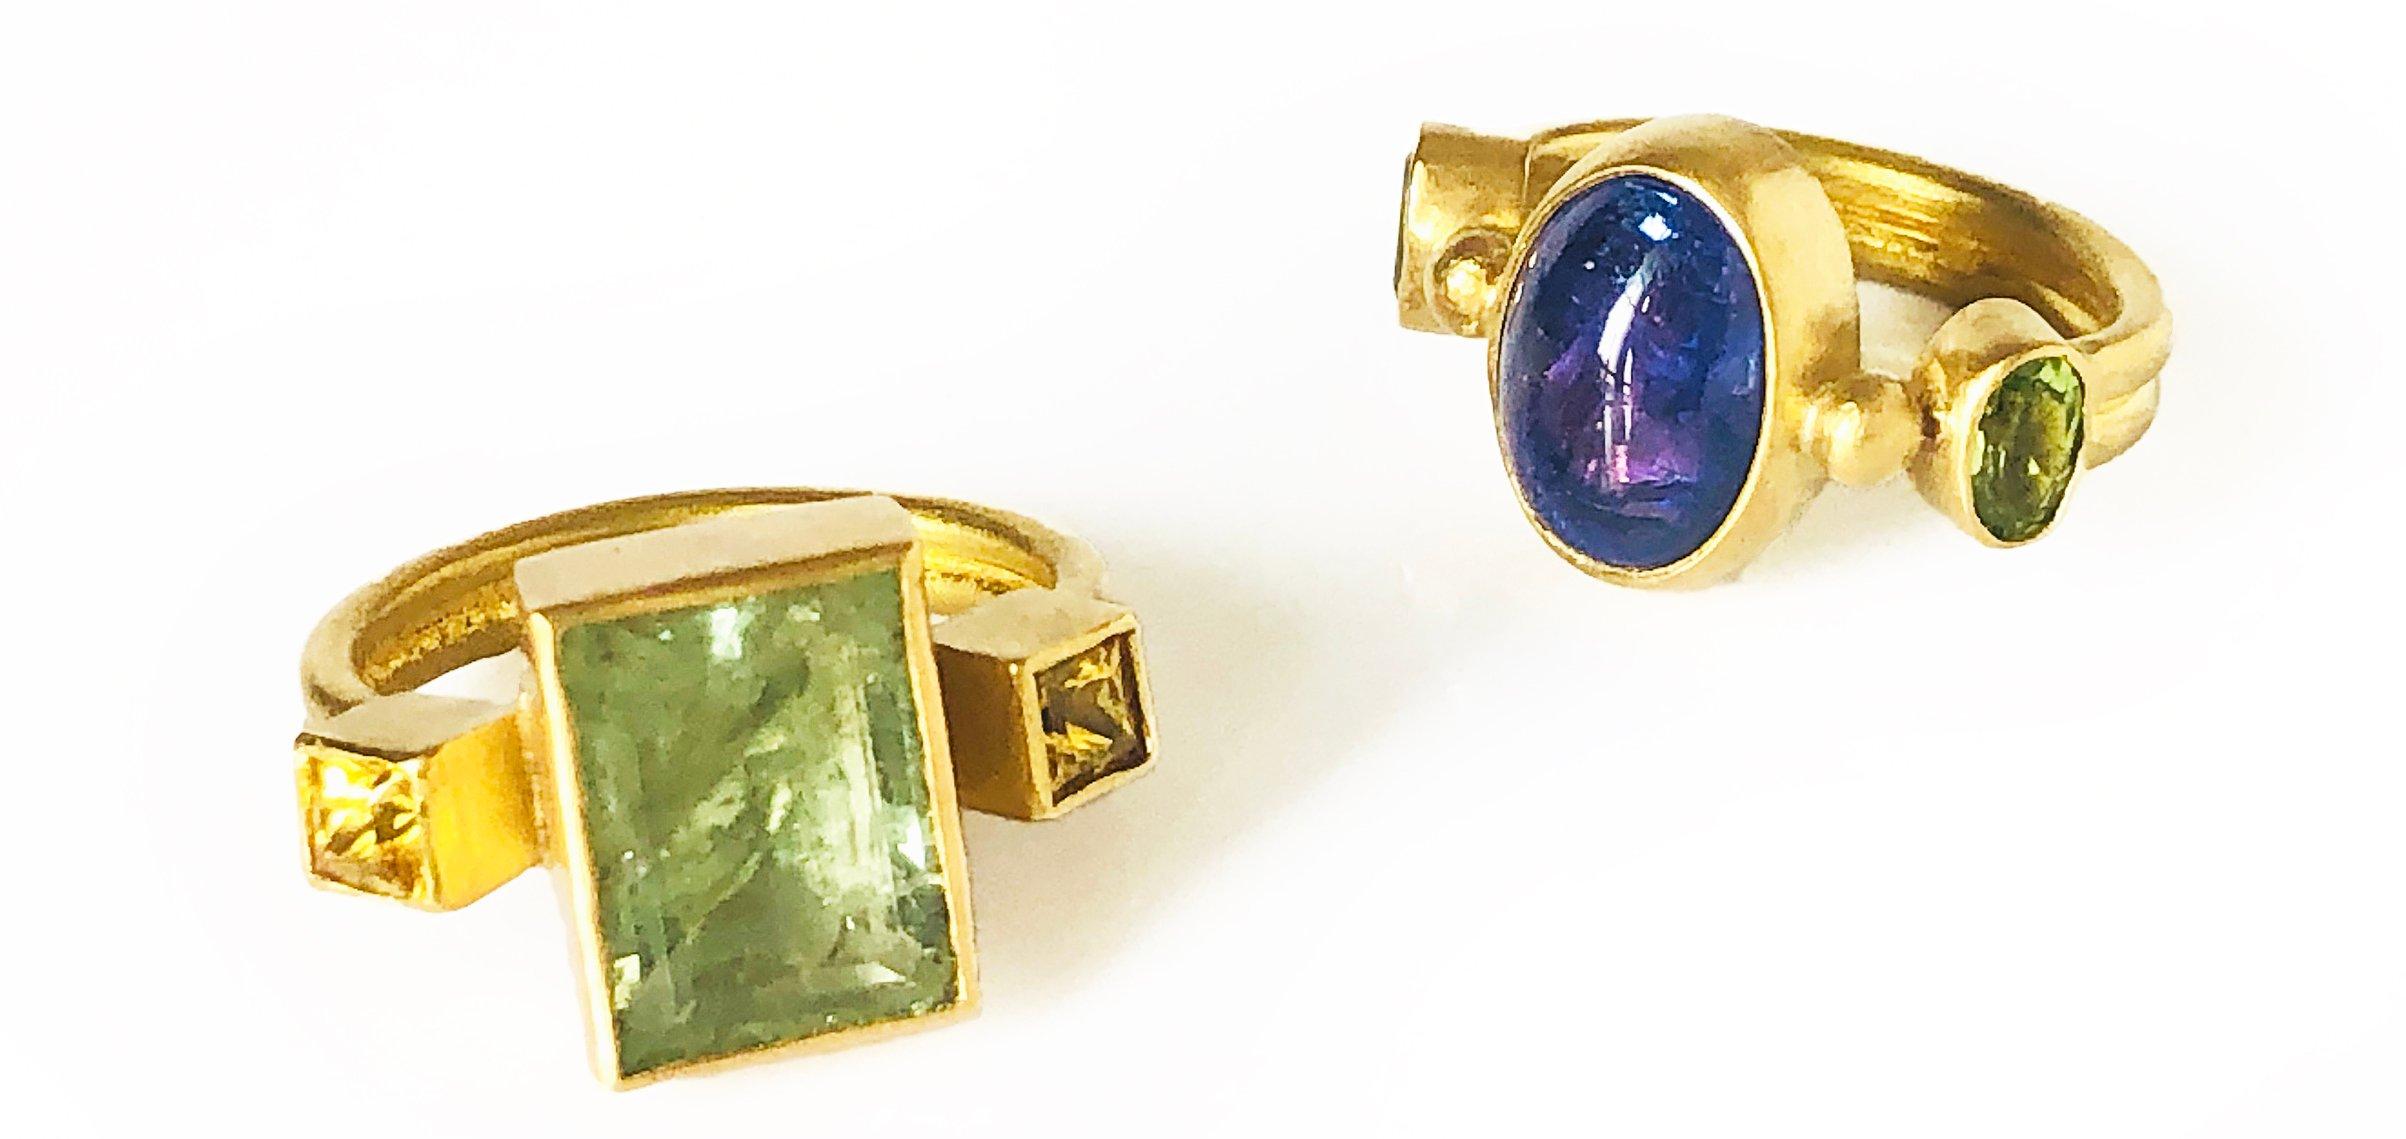 22k Rings by Katy Beh Jewelry